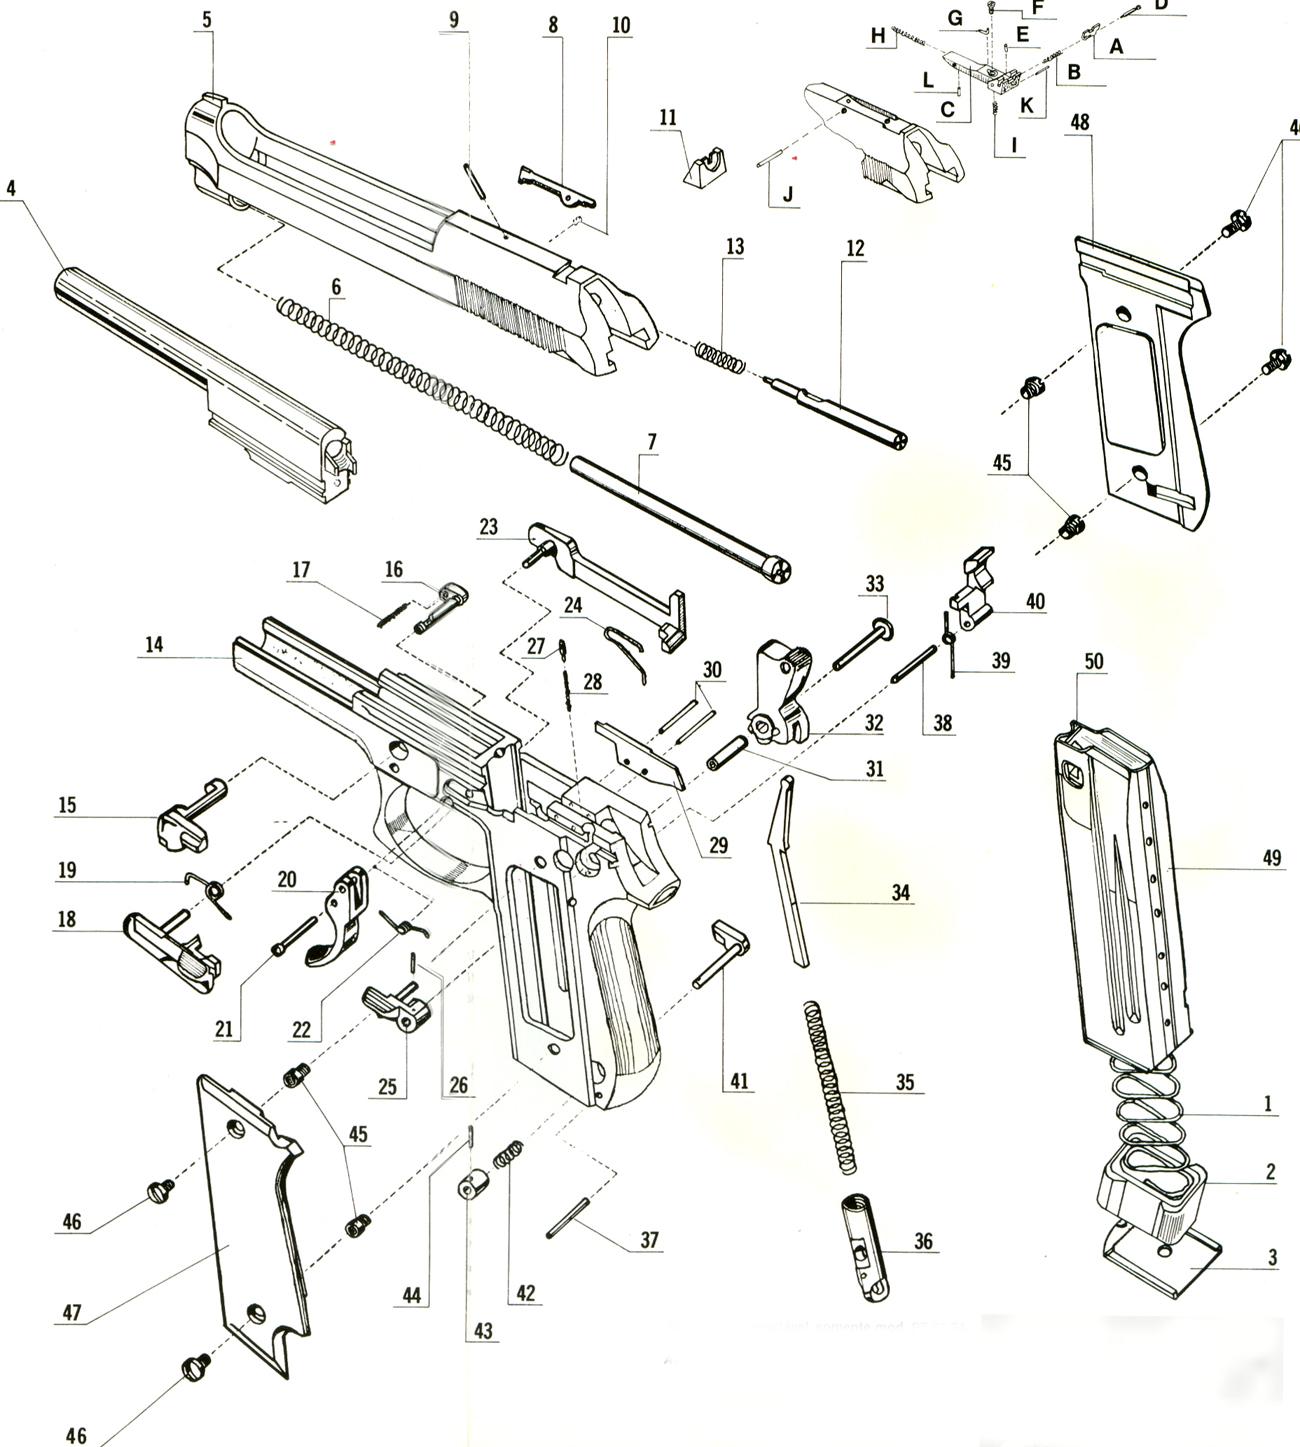 Beretta 7 65 Pistol